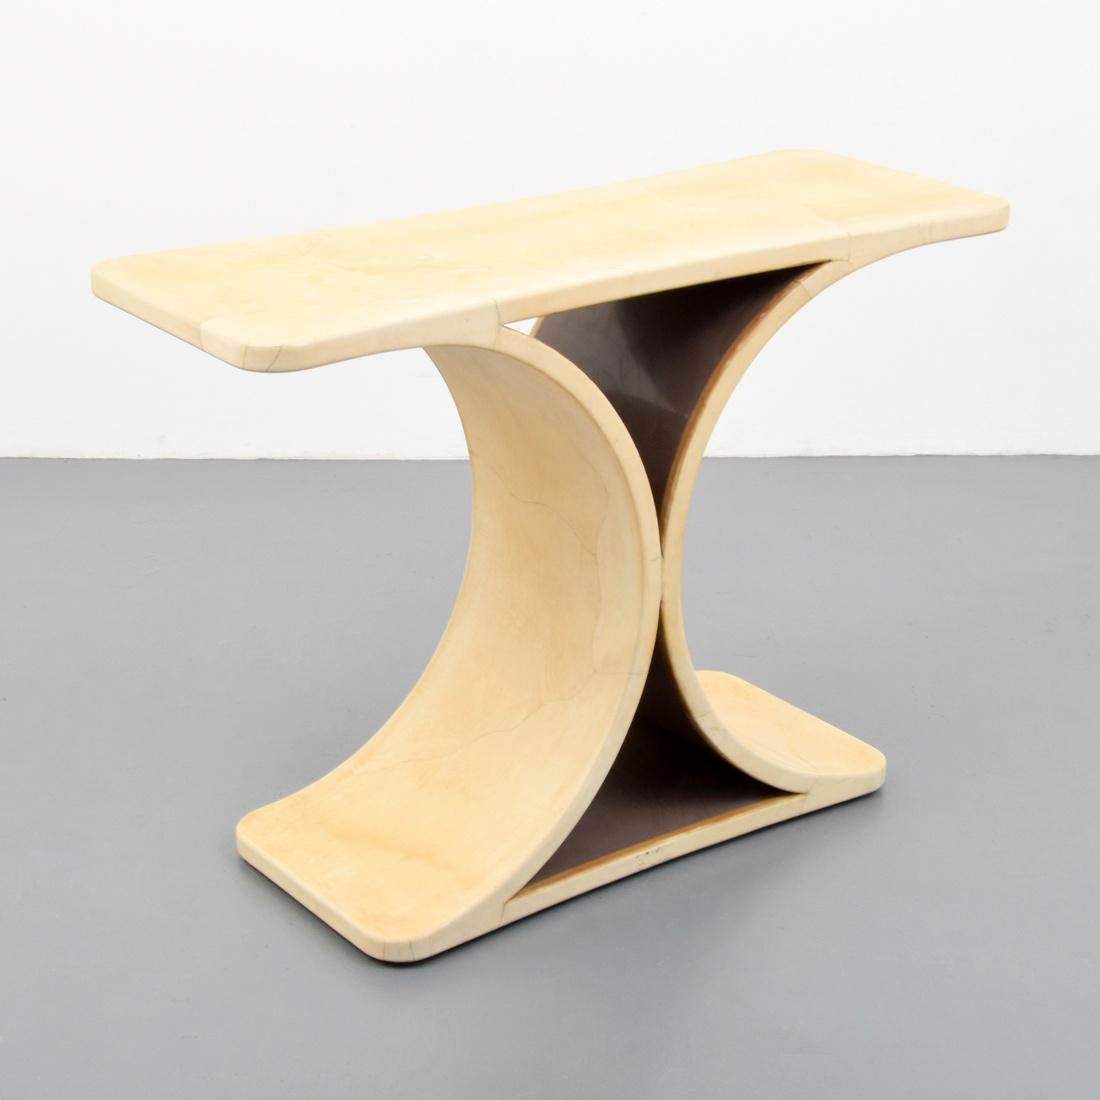 Karl Springer JMF Console Table